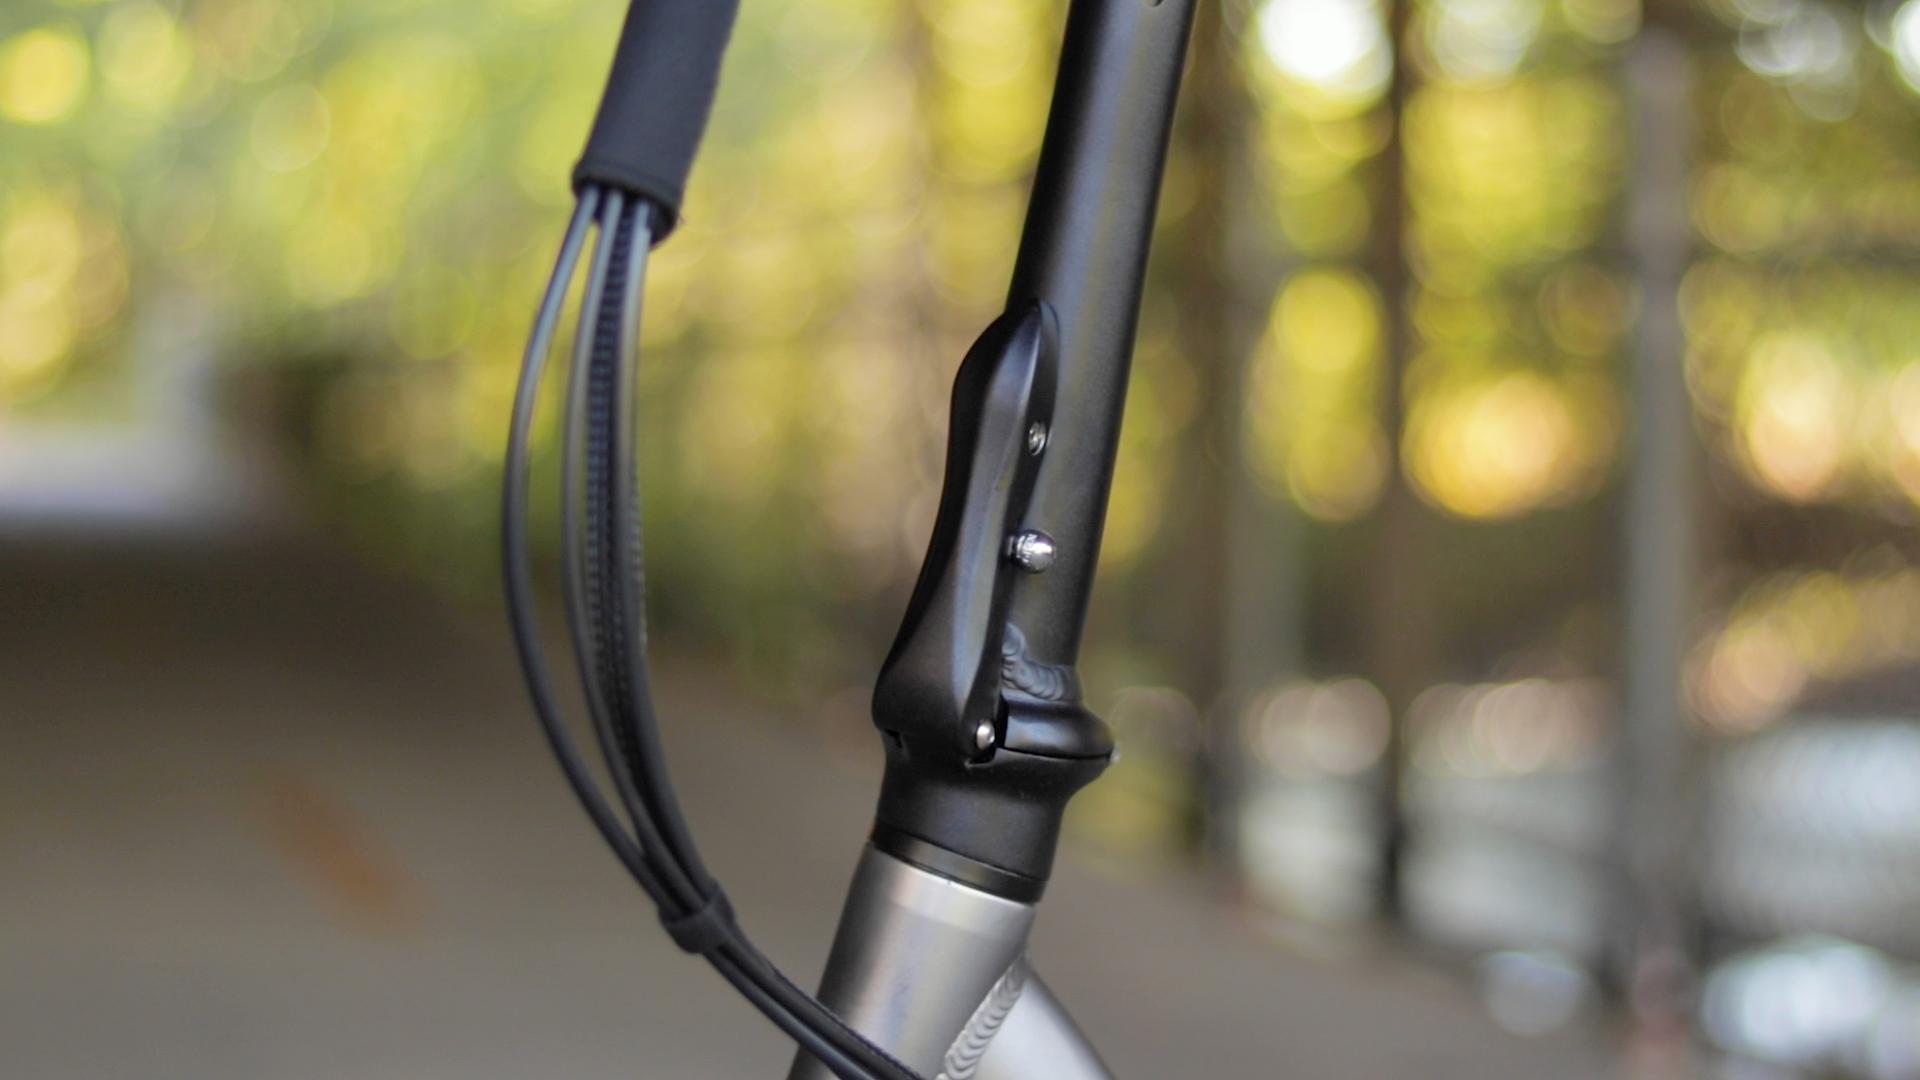 electrified-reviews-bagibike-b10-foldign-electric-bike-review-handlebar-latch.jpg